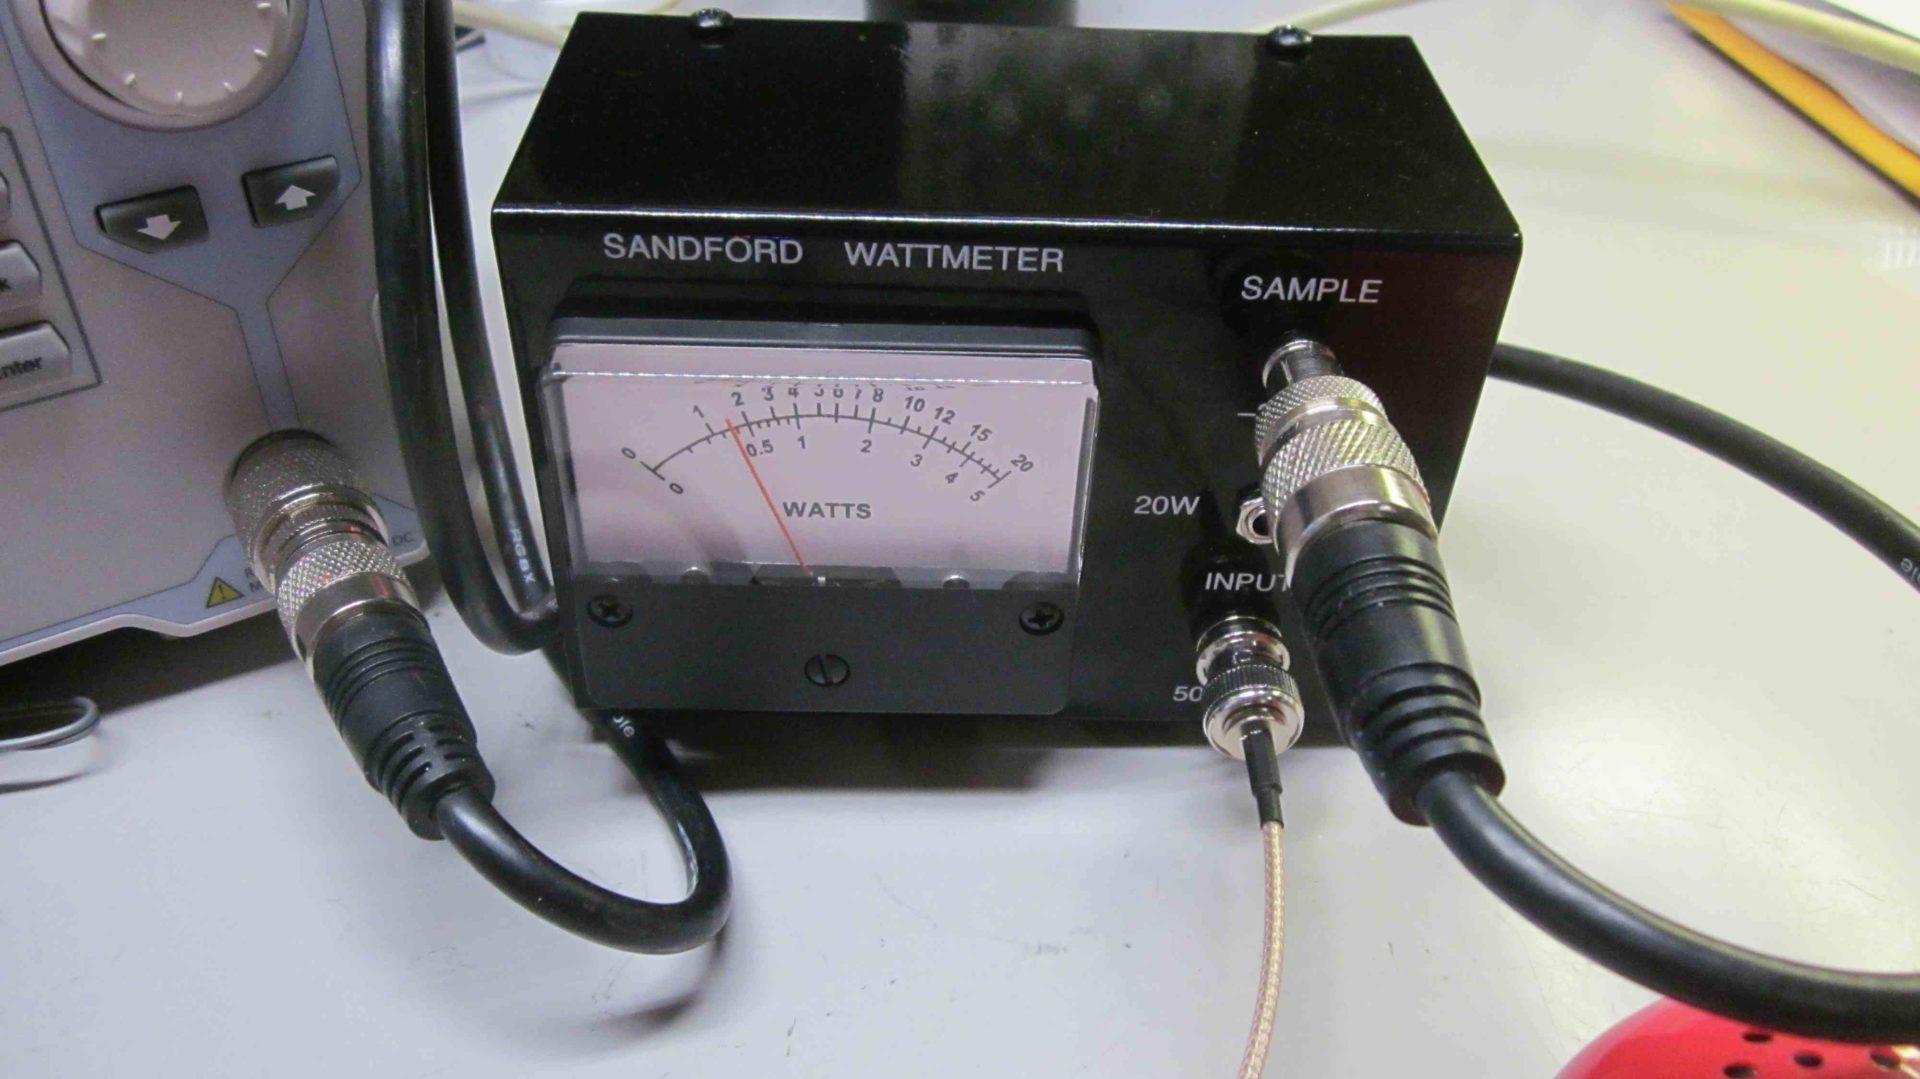 Sandford Wattmeter - 3rd Planet Solar / KC9ON